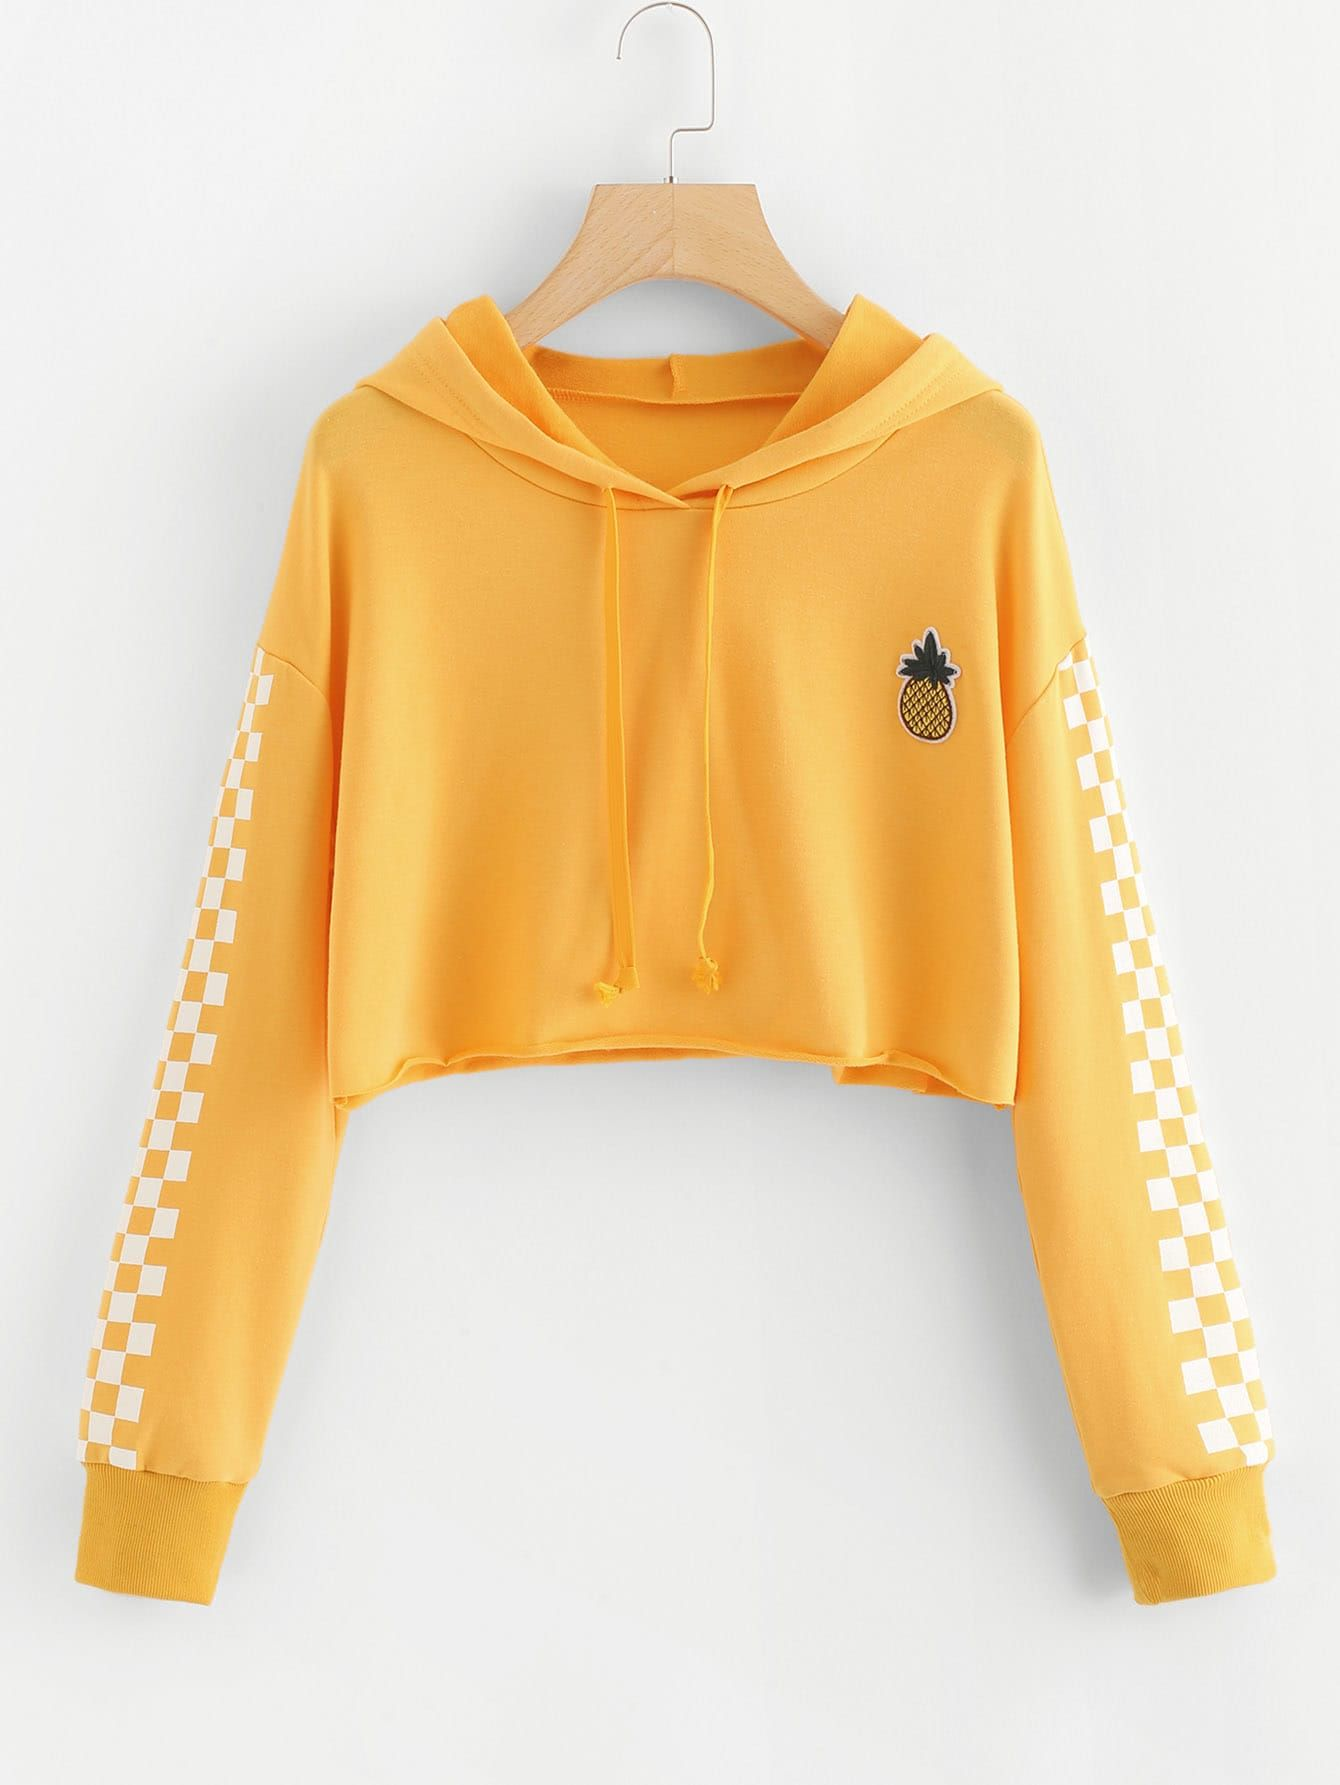 Women Teen Girls Pineapple Printed Shirt Autumn Long Sleeve Tops Fashion Cutout Neck Crop Tops